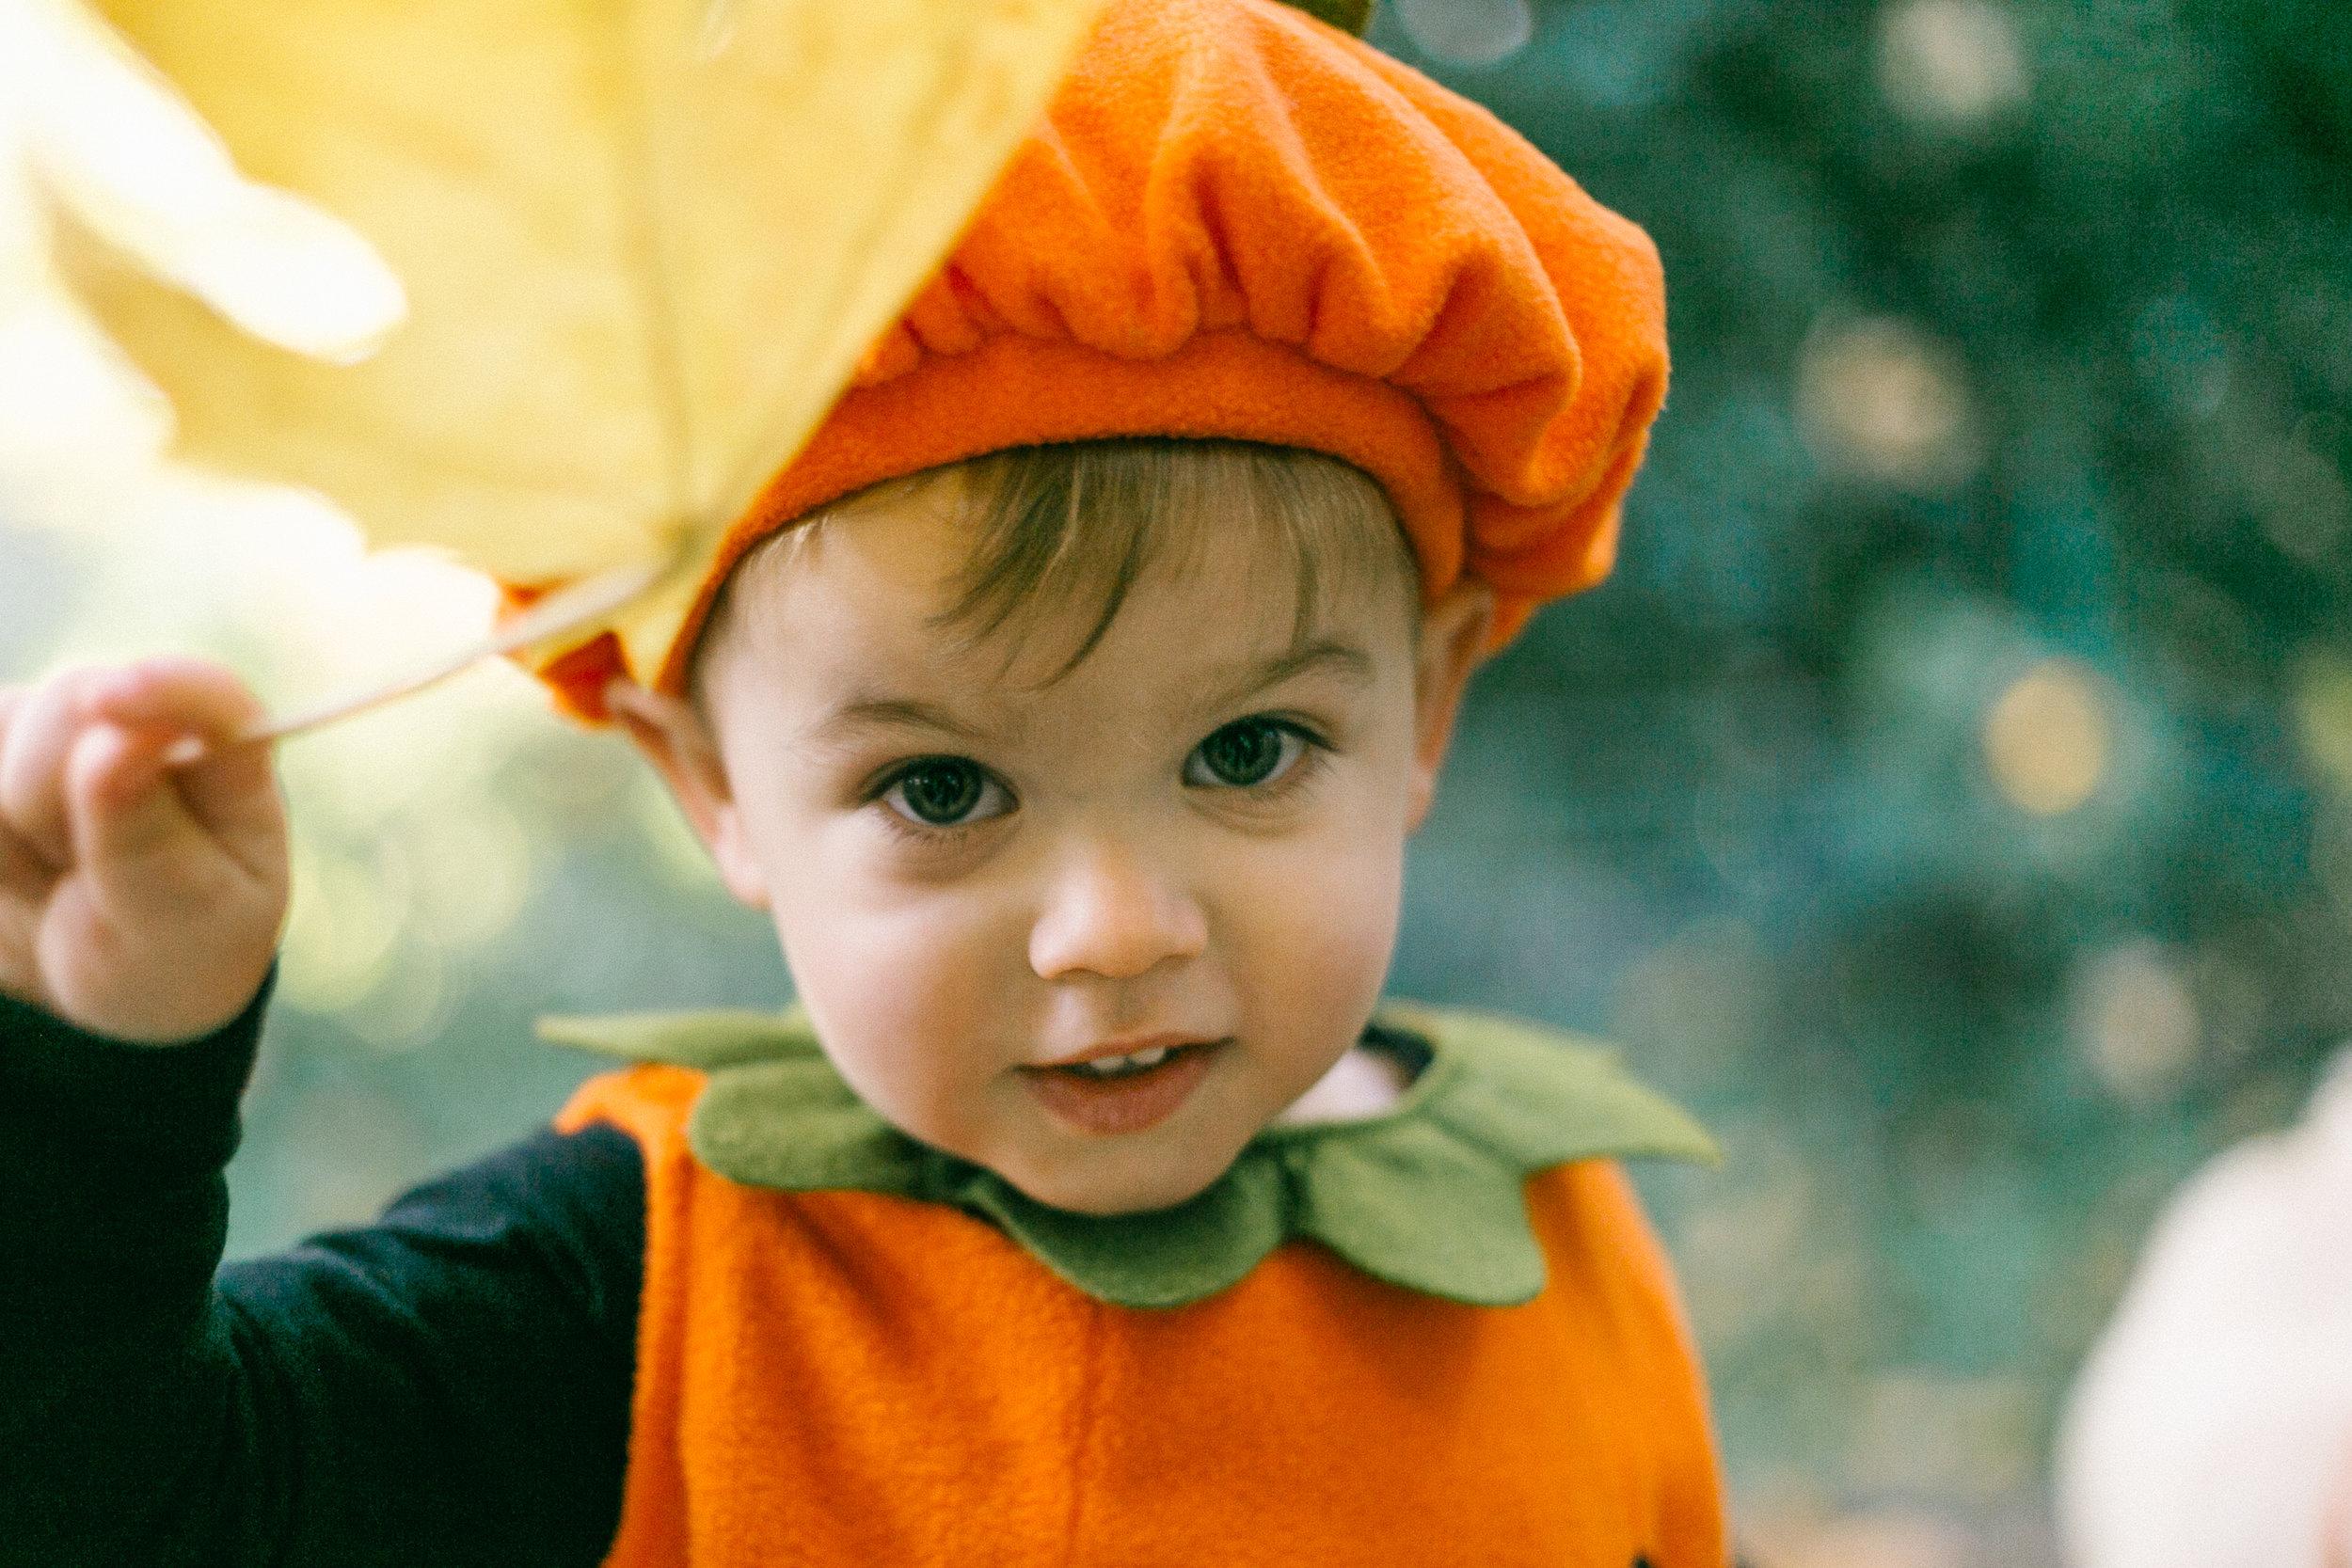 Halloween Kid Portraits at Home | Chelsea Macor Photography-7.jpg